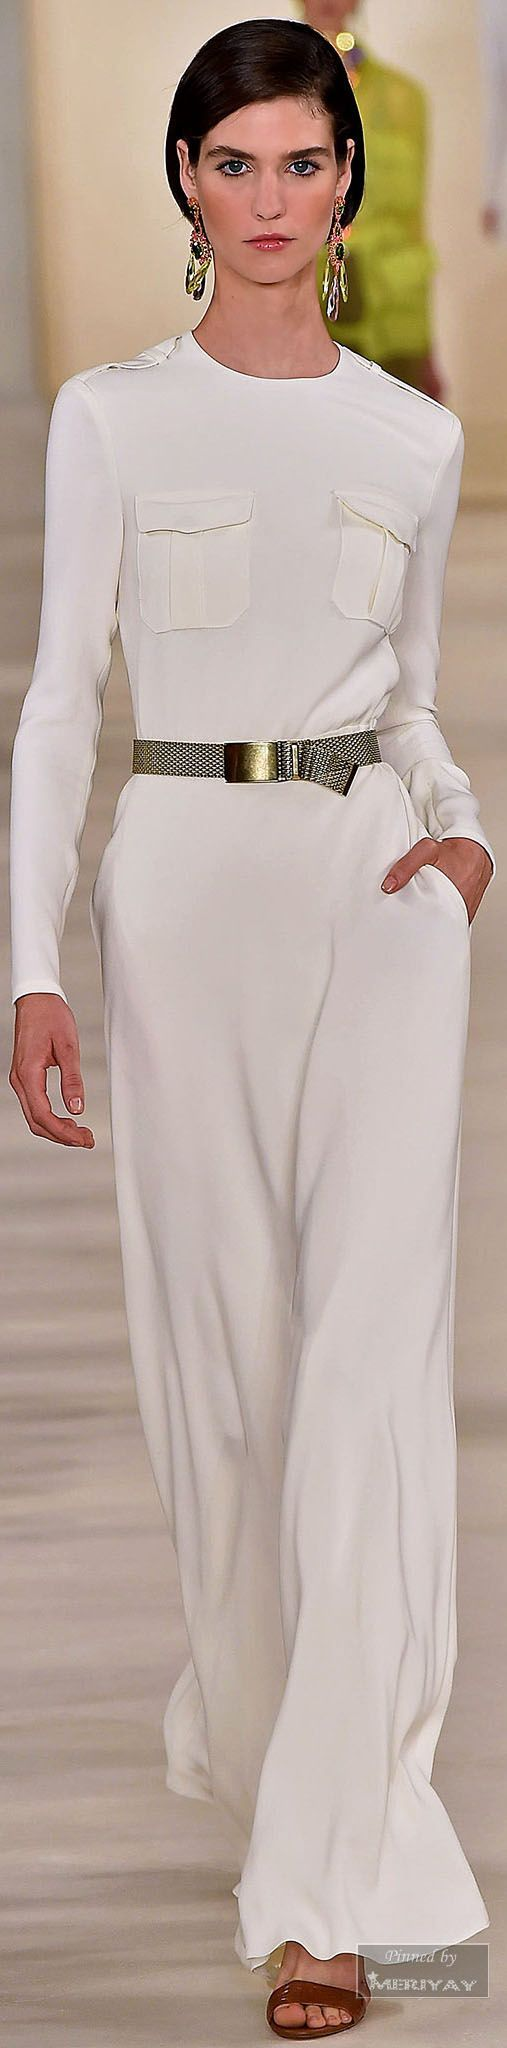 Ralph Lauren.Spring 2015. longsleeve white maxi dress modest | Follow Mode-sty for stylish #modest clothing www.mode-sty.com #sleevesplease #nolayering